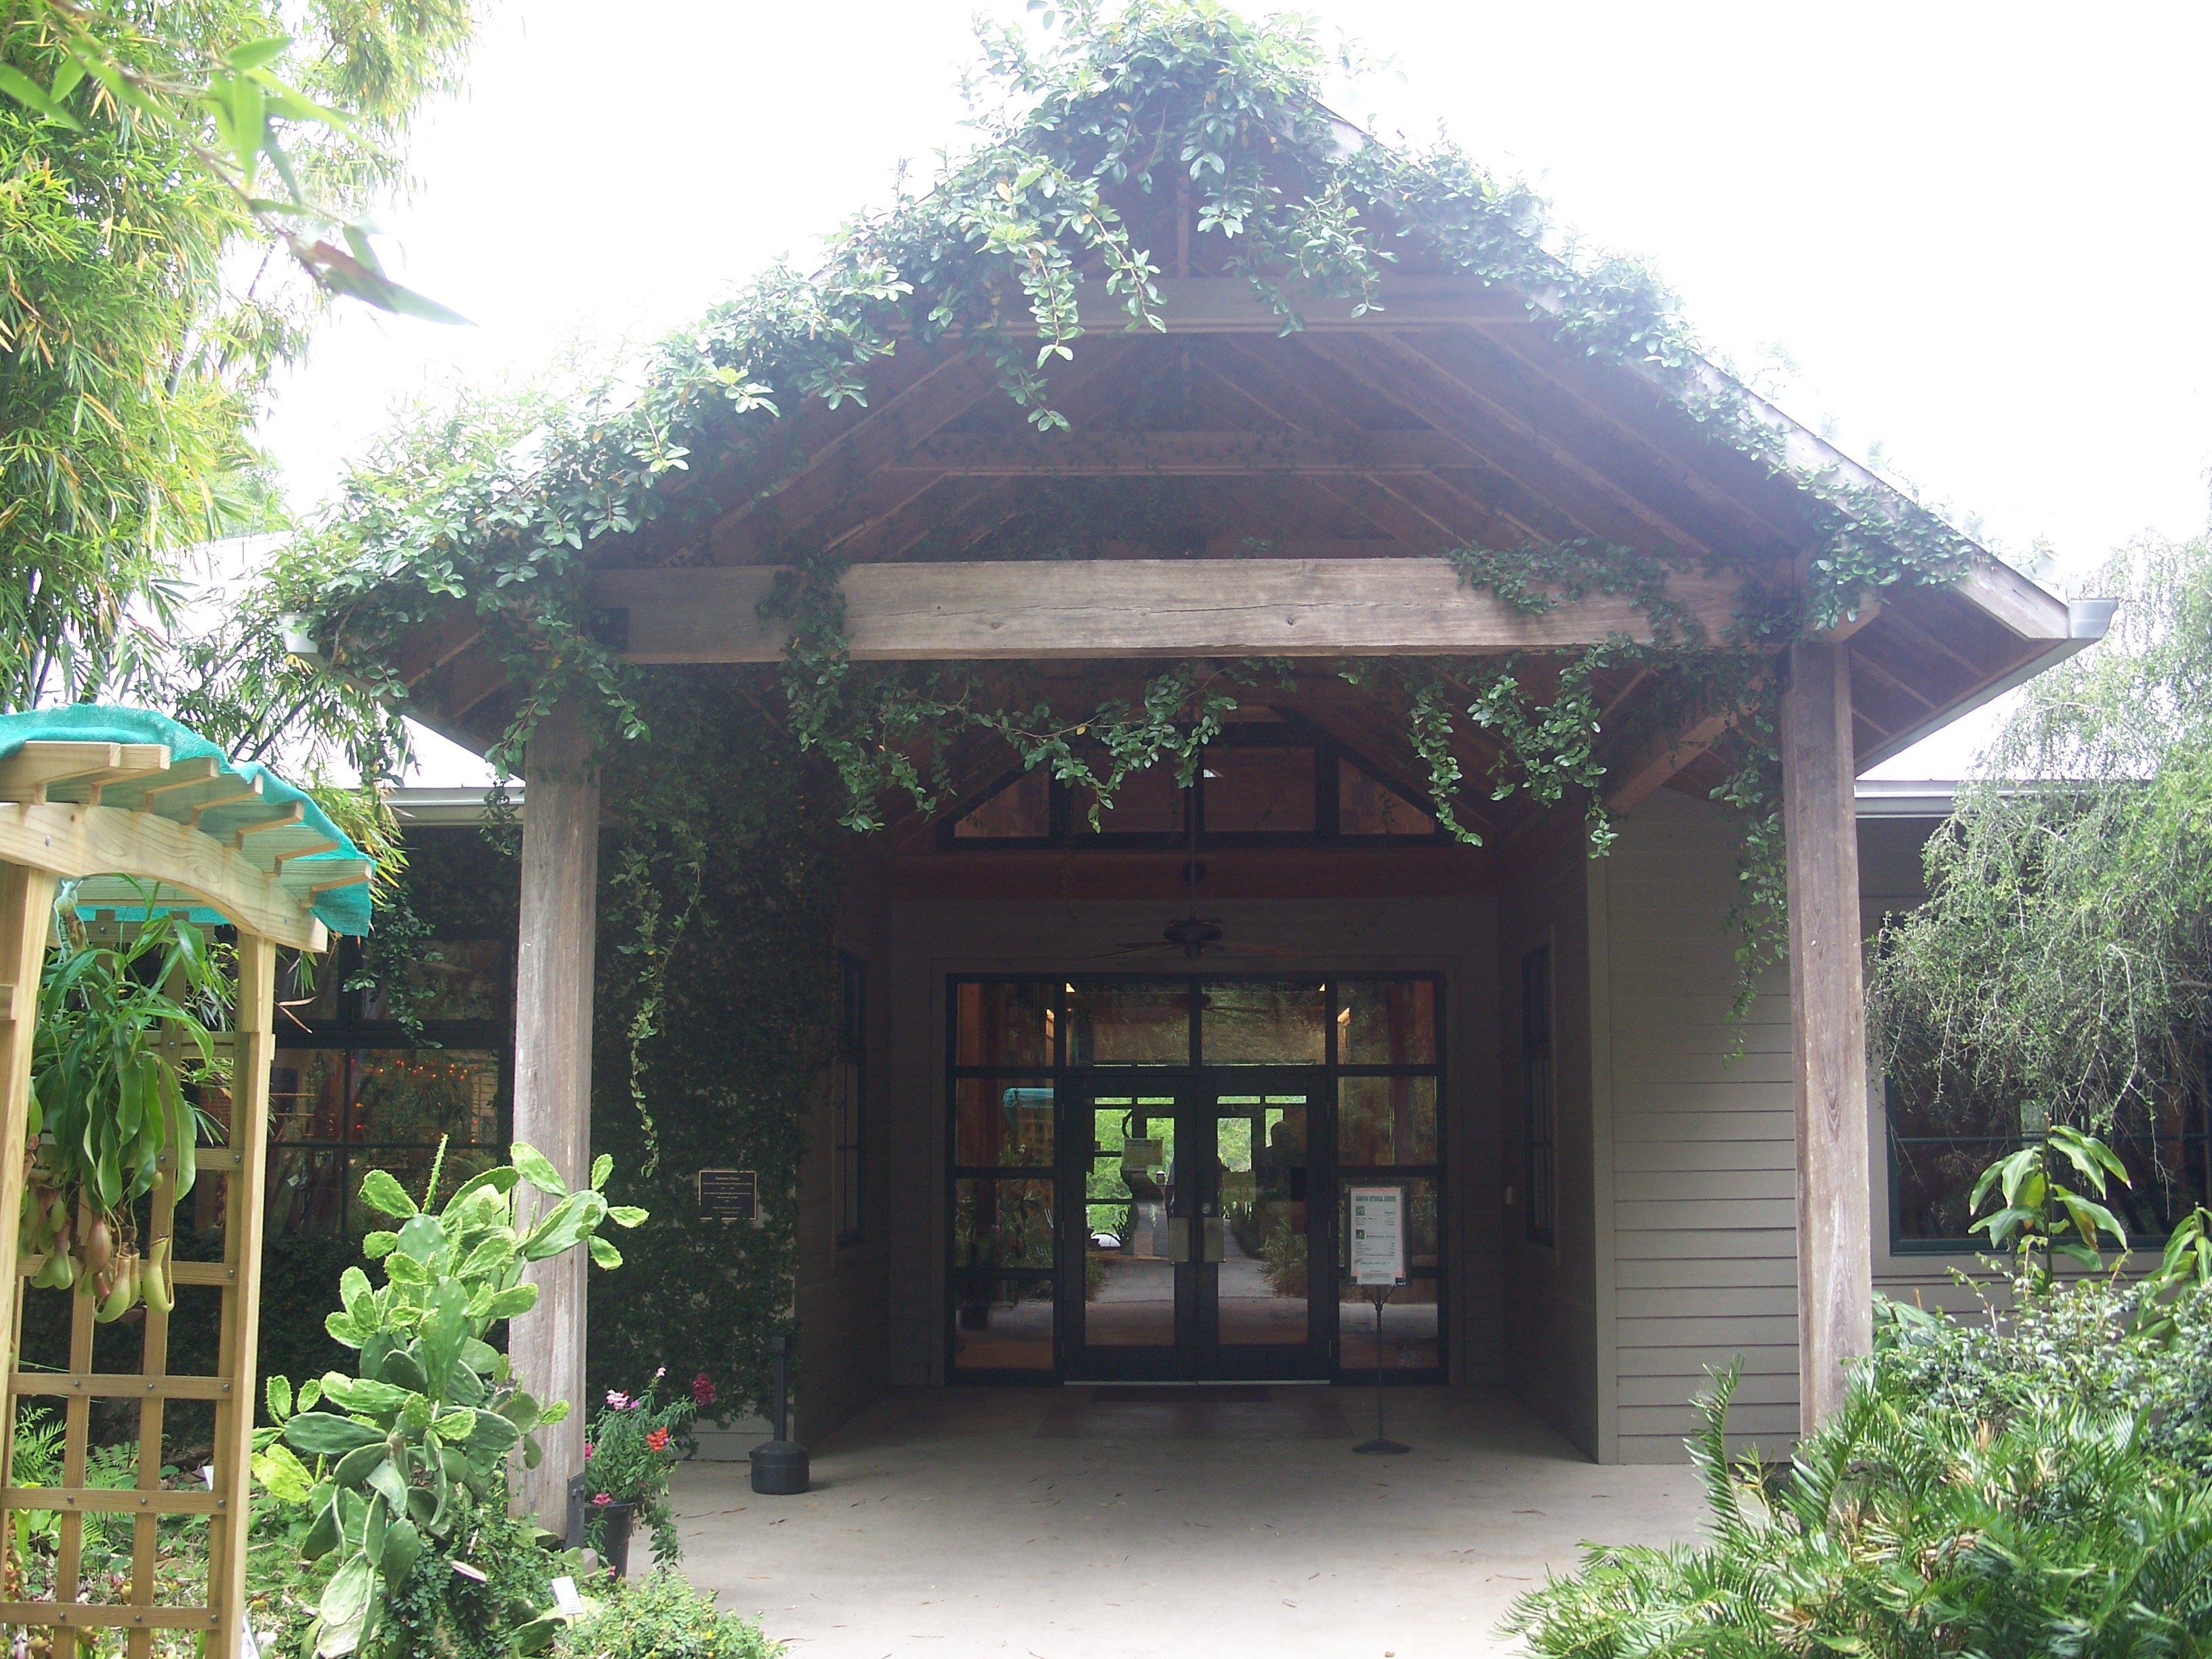 File:Gainesville FL Kanapaha Botanical Gardens Bldg01